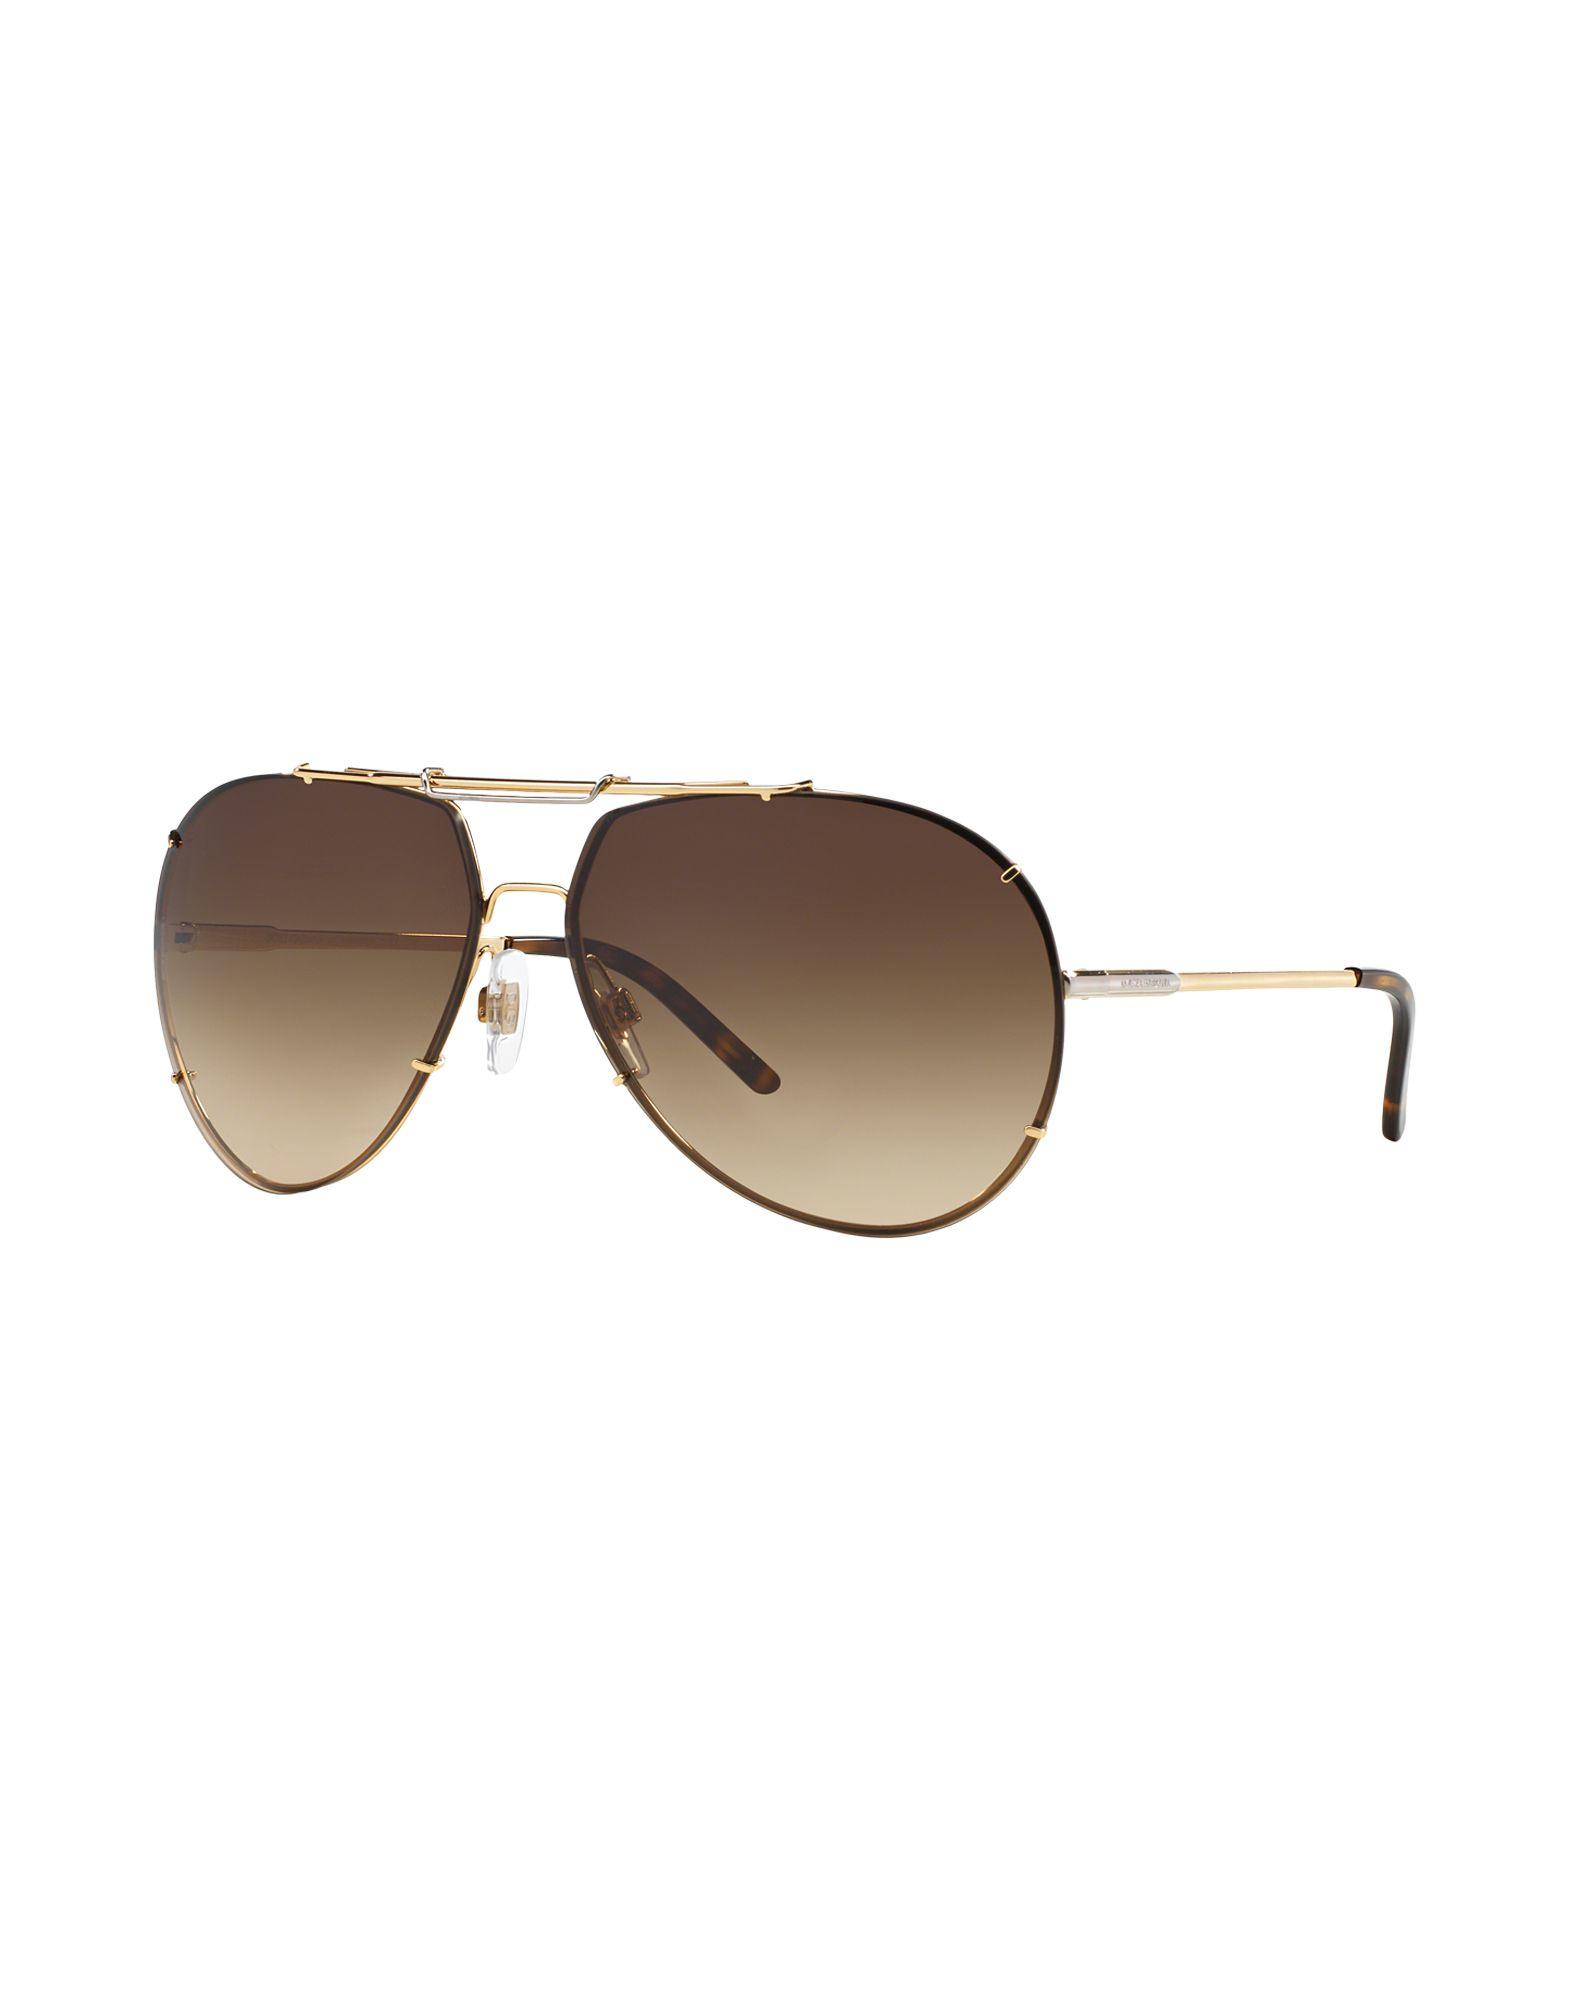 2f7e011dd03a6 Dolce Gabbana Men s Sunglasses